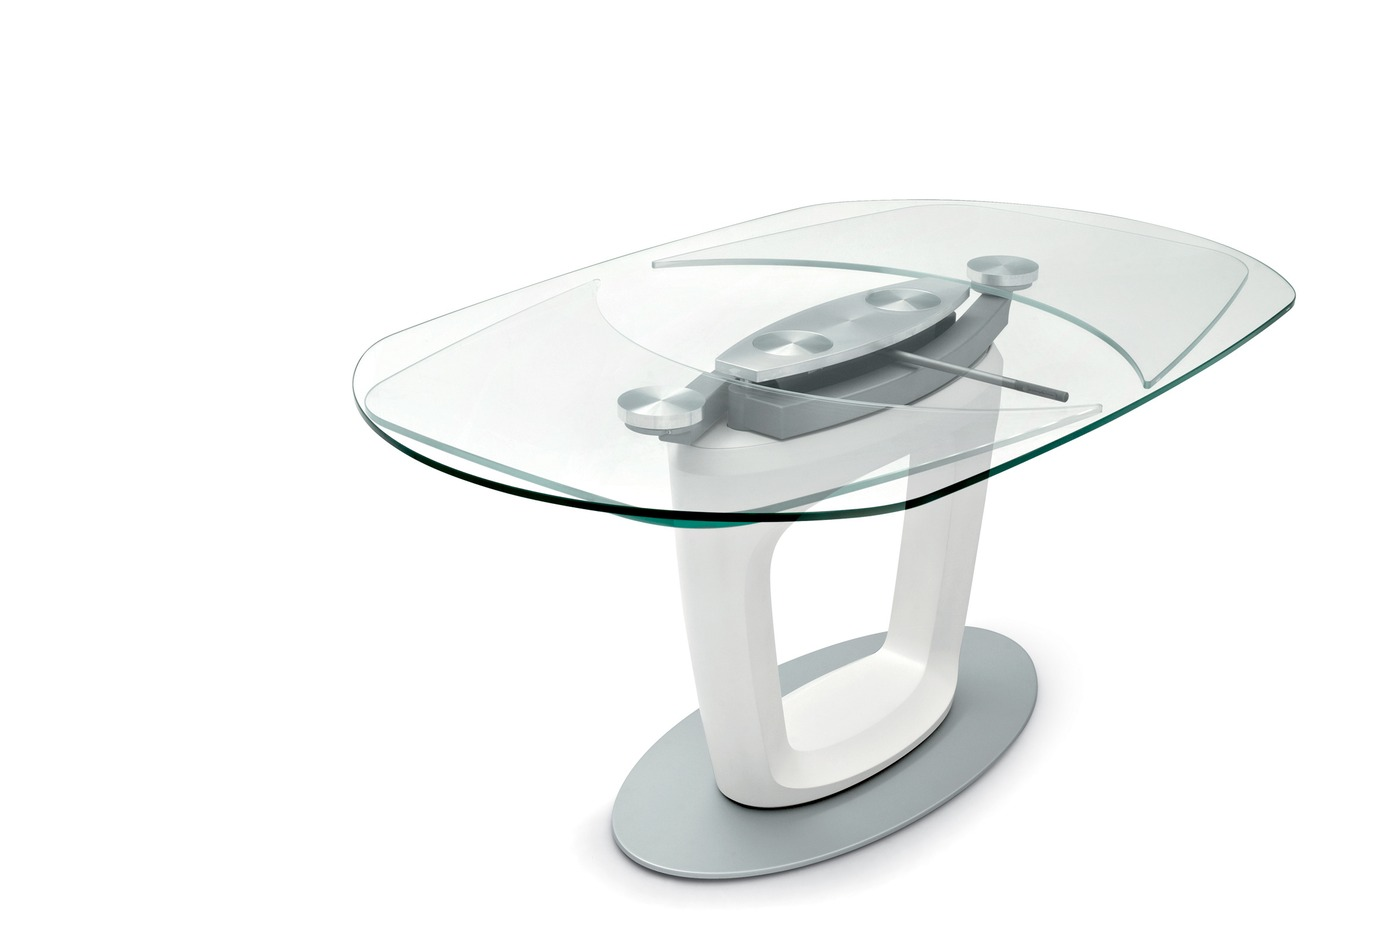 ORBITAL tavolo firmato Pininfarina | Calligaris Table by ...